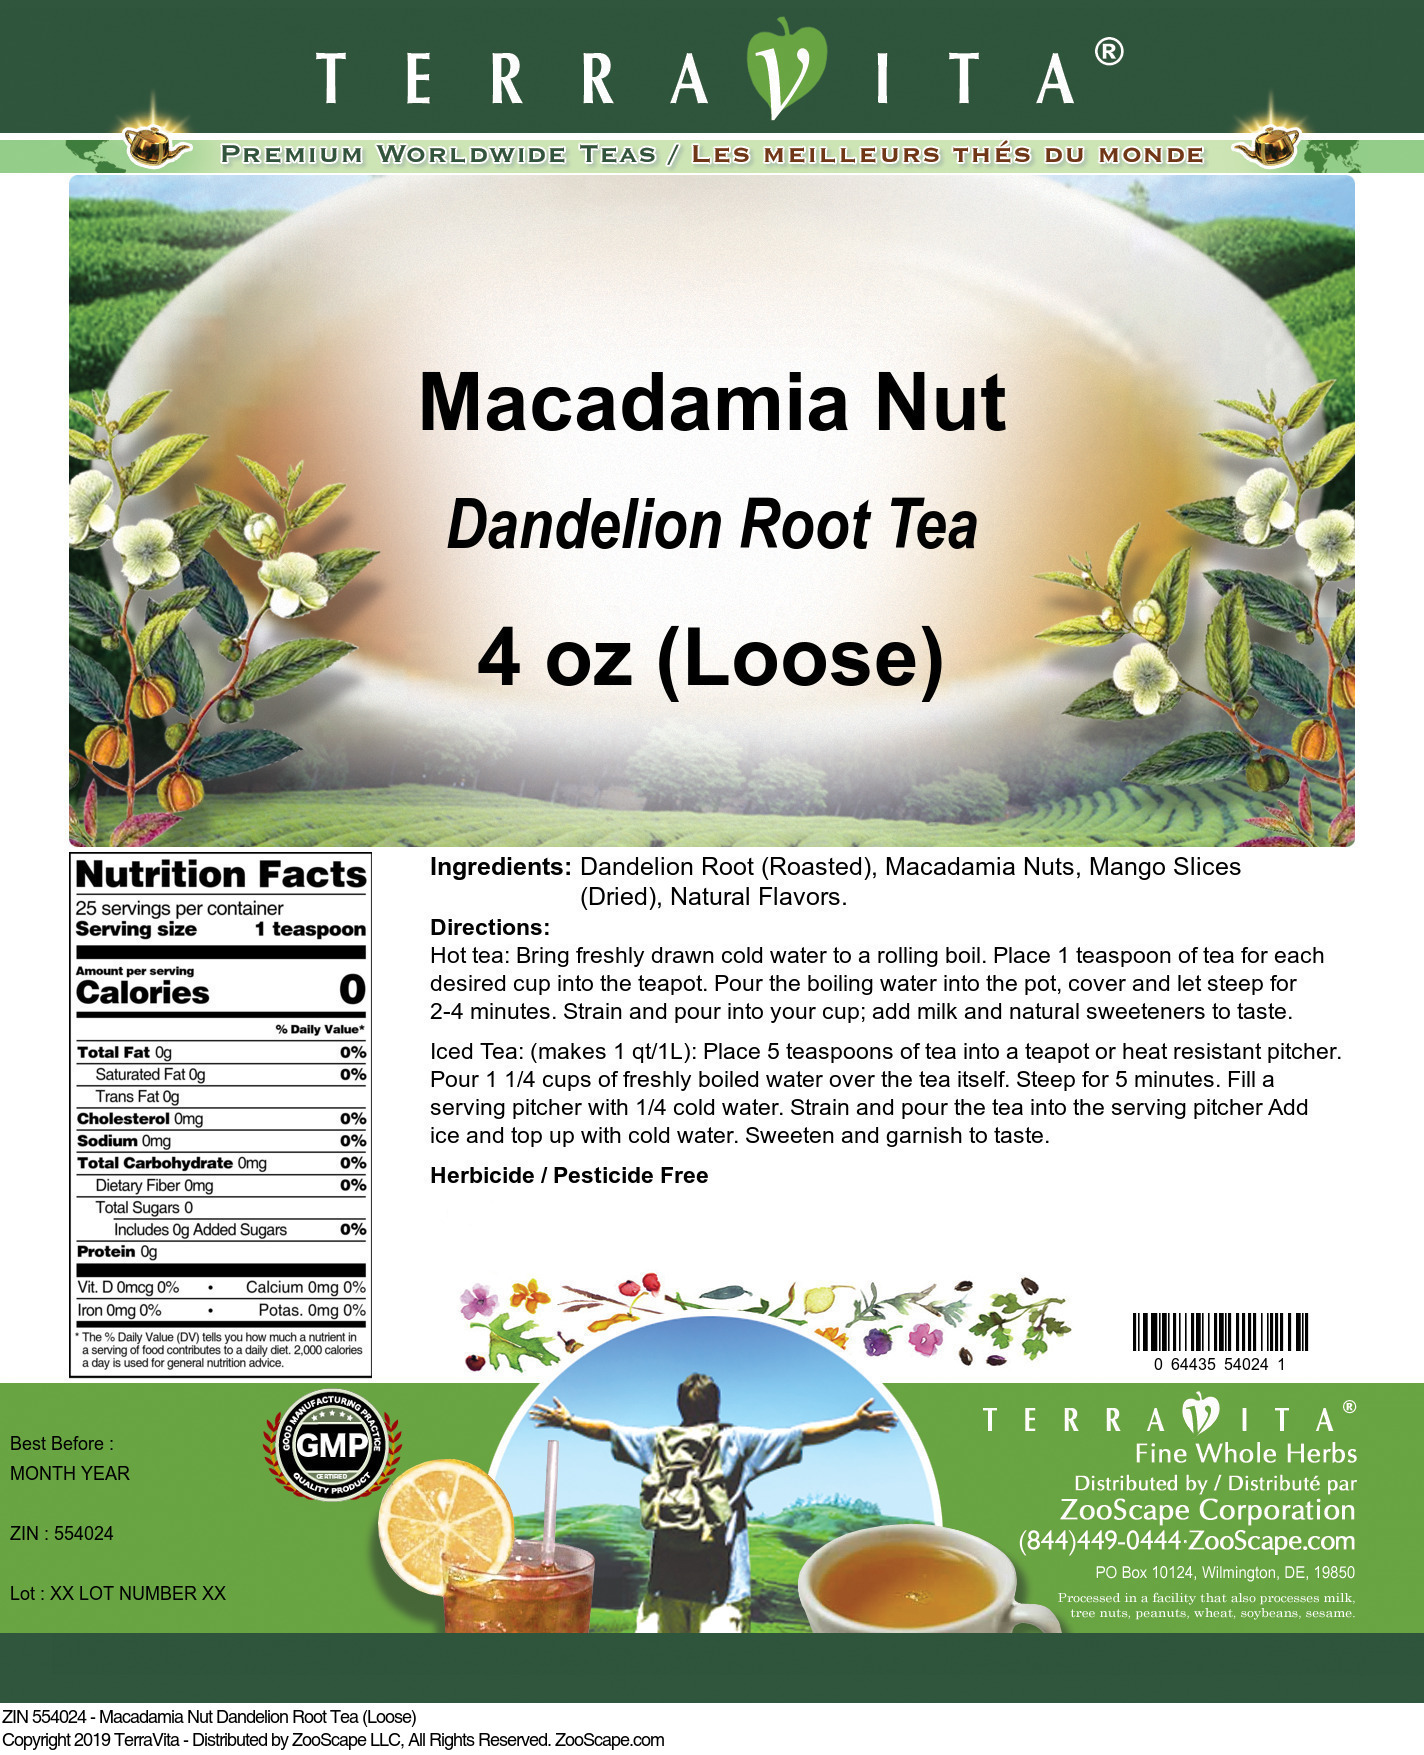 Macadamia Nut Dandelion Root Tea (Loose)